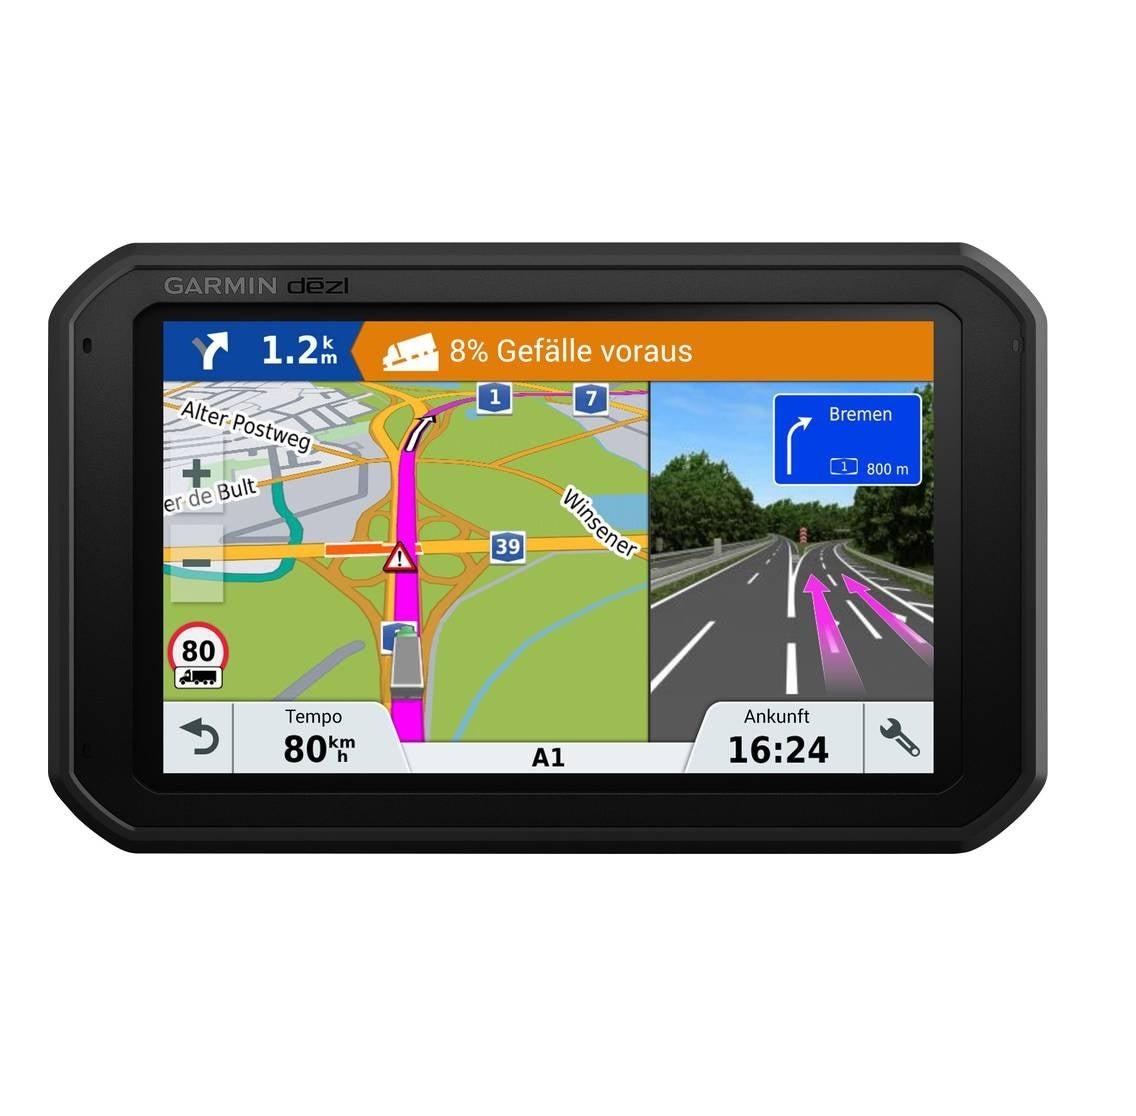 Garmin DezlCam 785 LMTS GPS Device